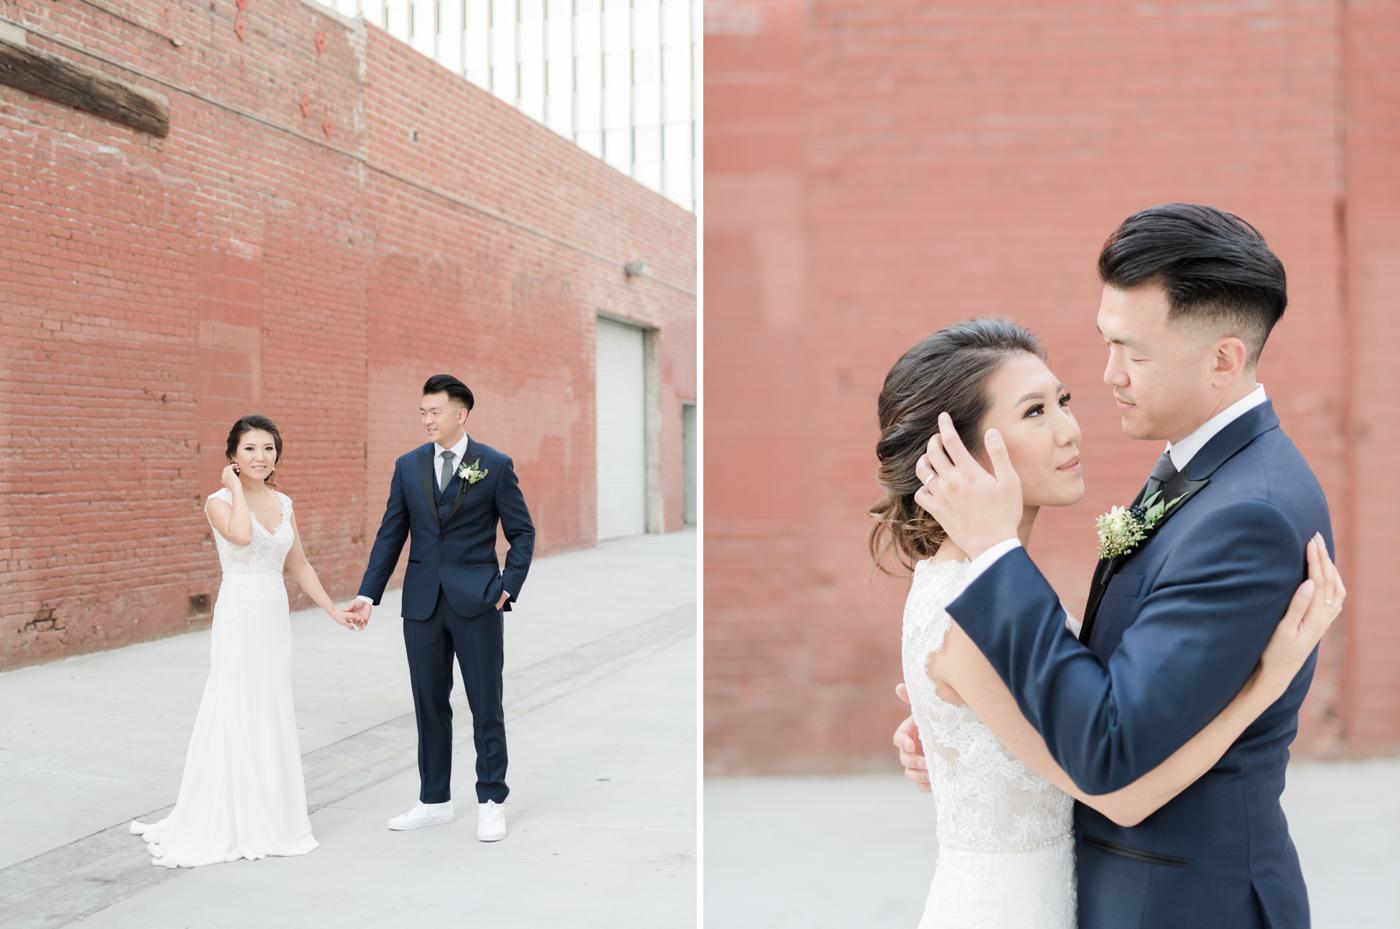 Modern_Wedding_HNYPT_Honeypot_LA_Photographer_Los_Angeles-41.jpg